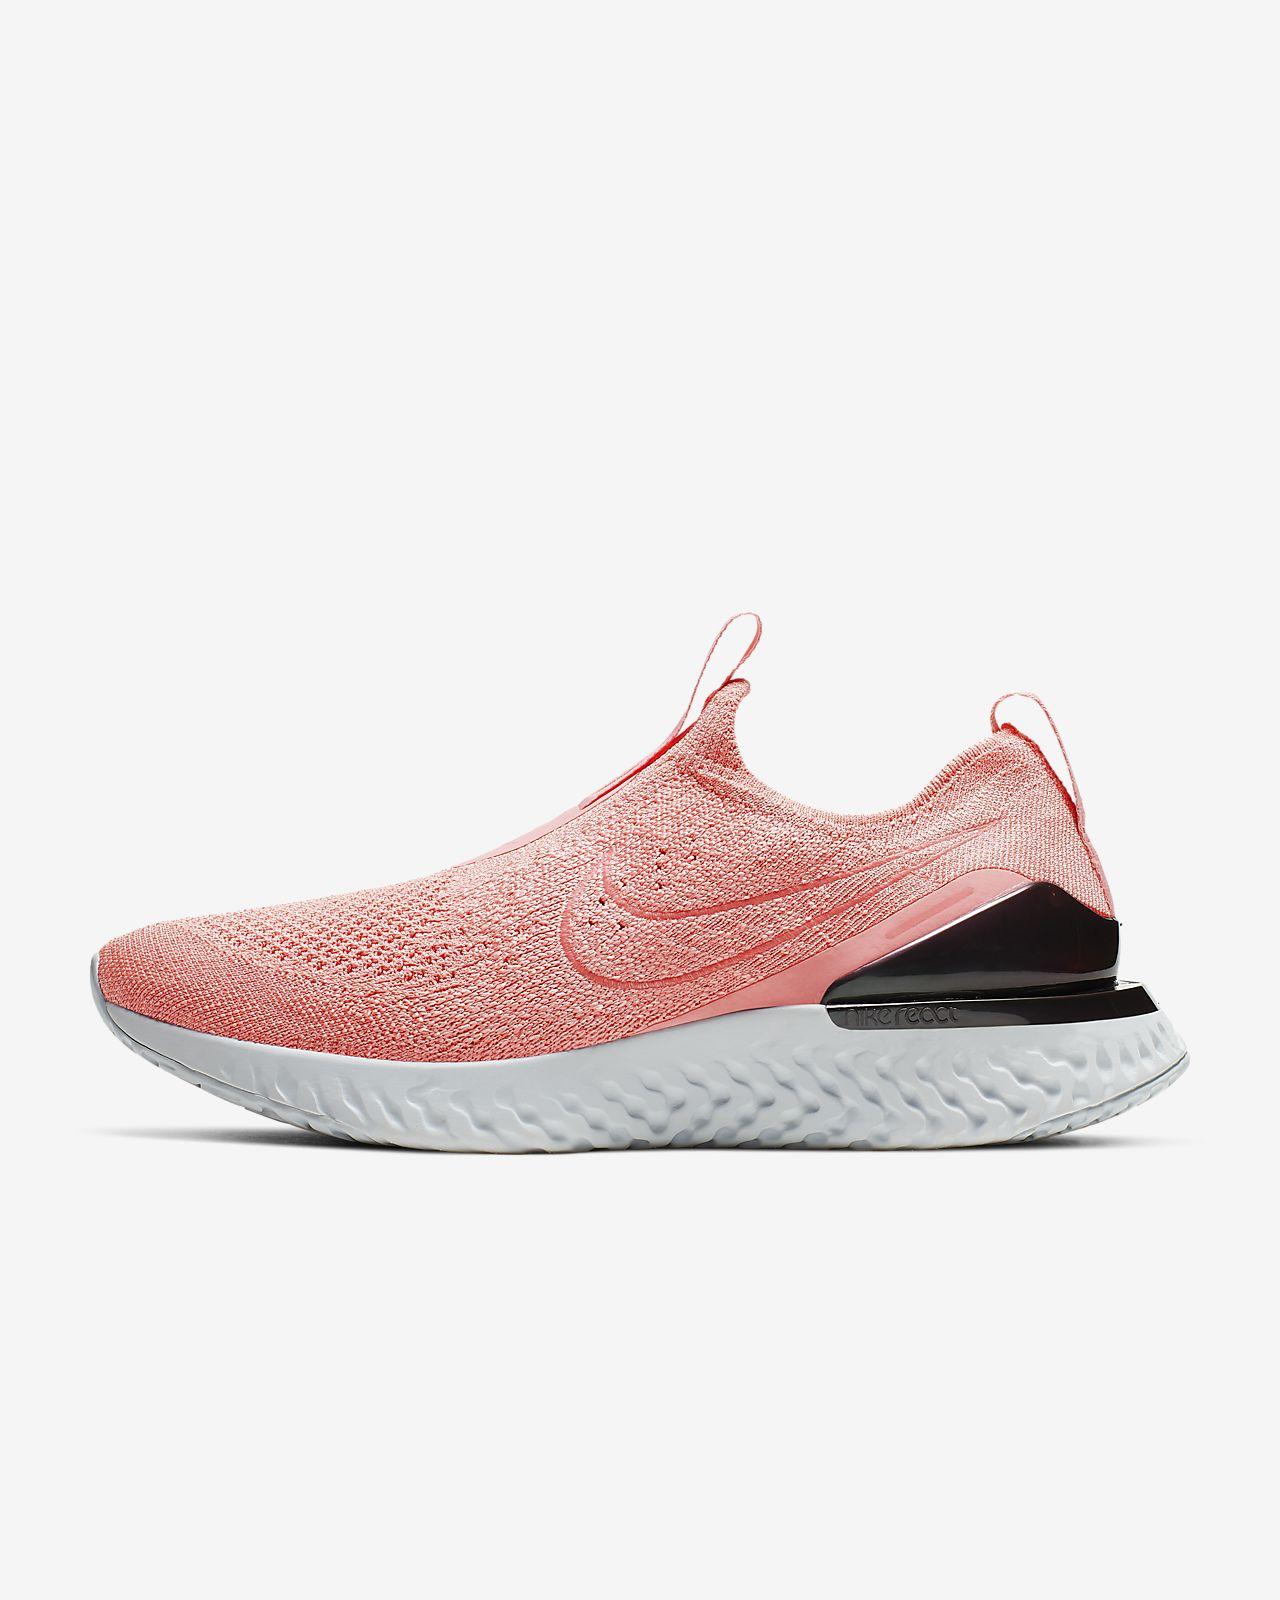 Nike Epic Phantom React Flyknit Women's